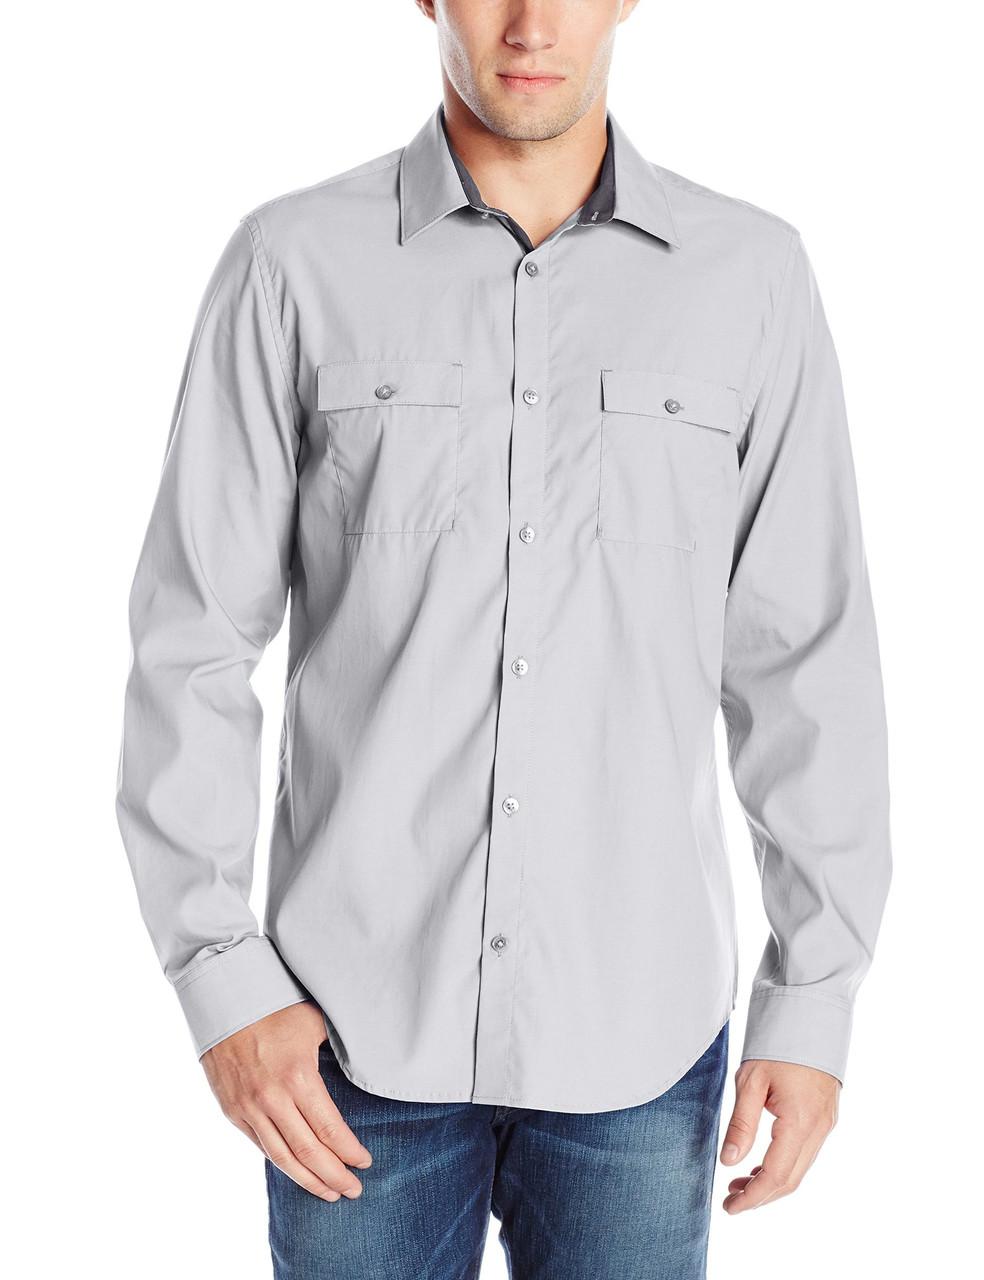 Рубашка Calvin Klein Jeans, M, Silver Filigree, 40QW185-045